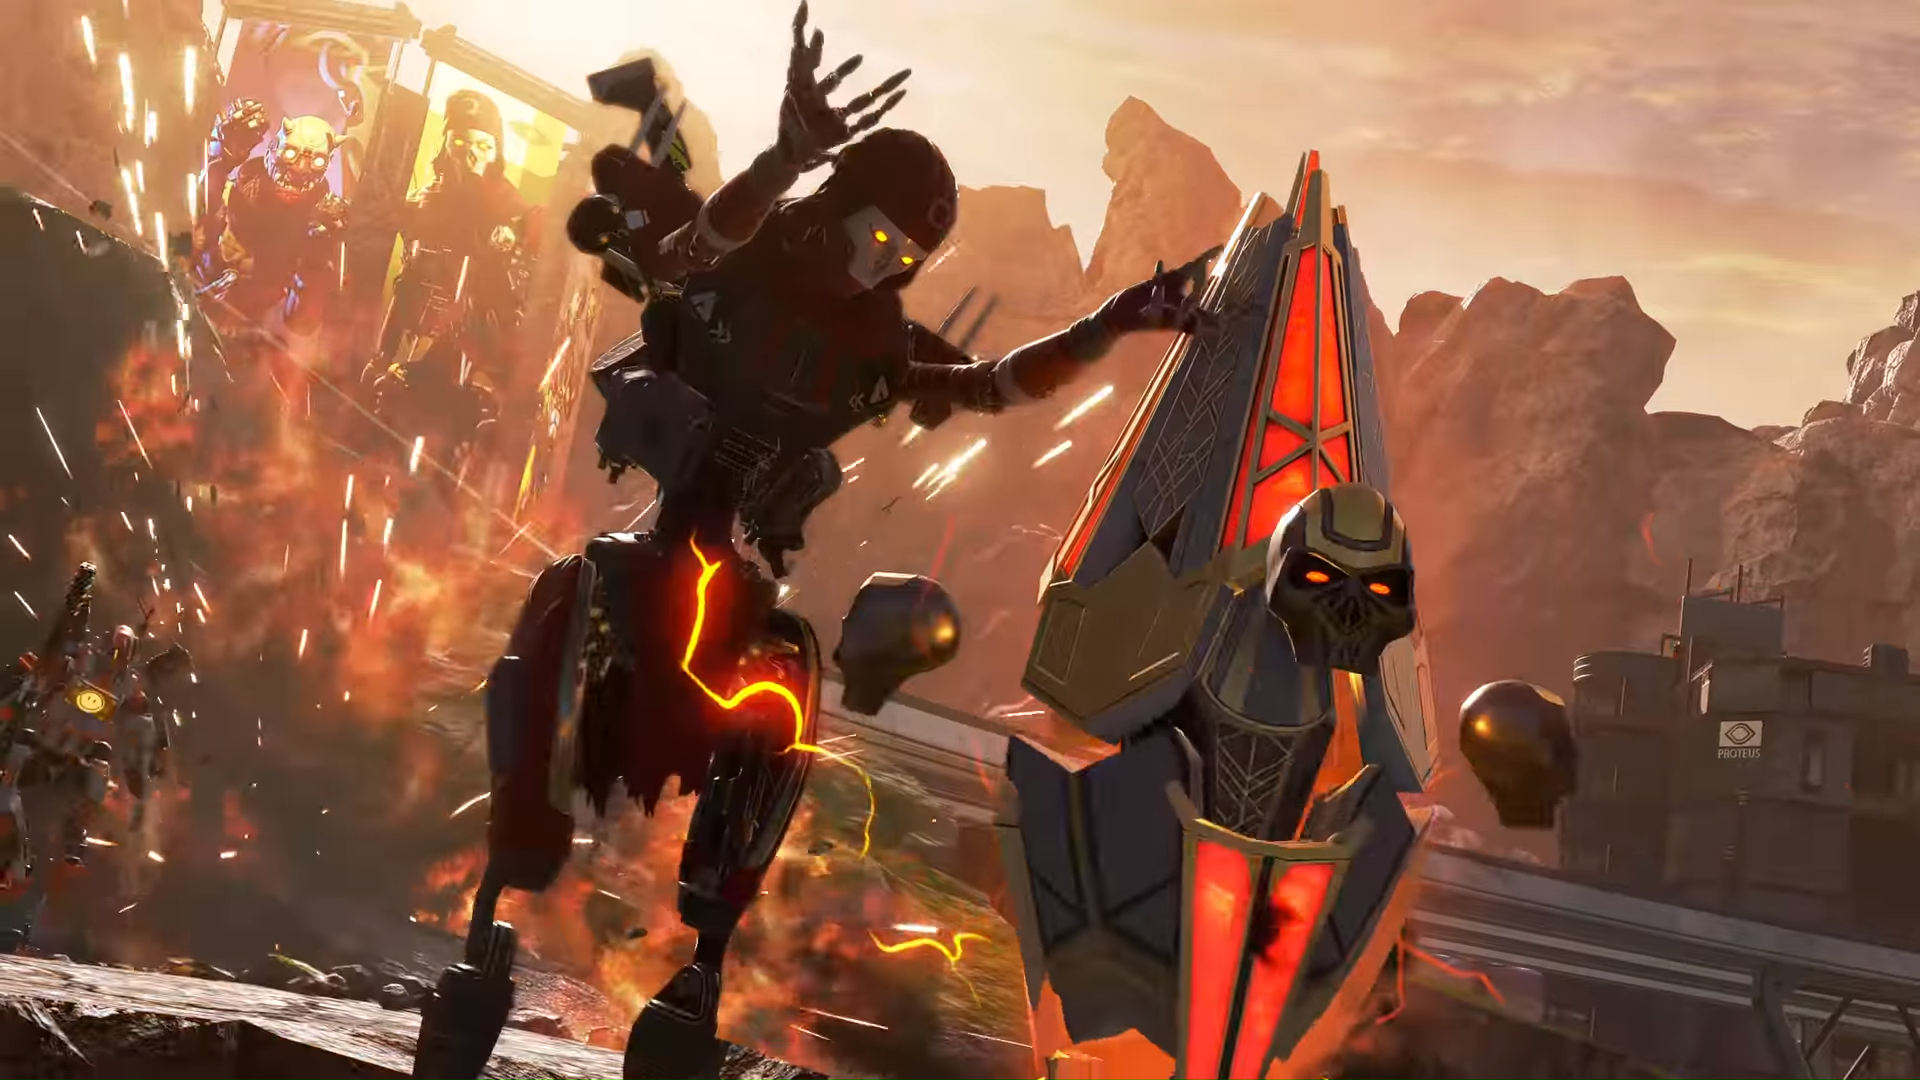 Apex Legends' Revenant using their Death Totem.